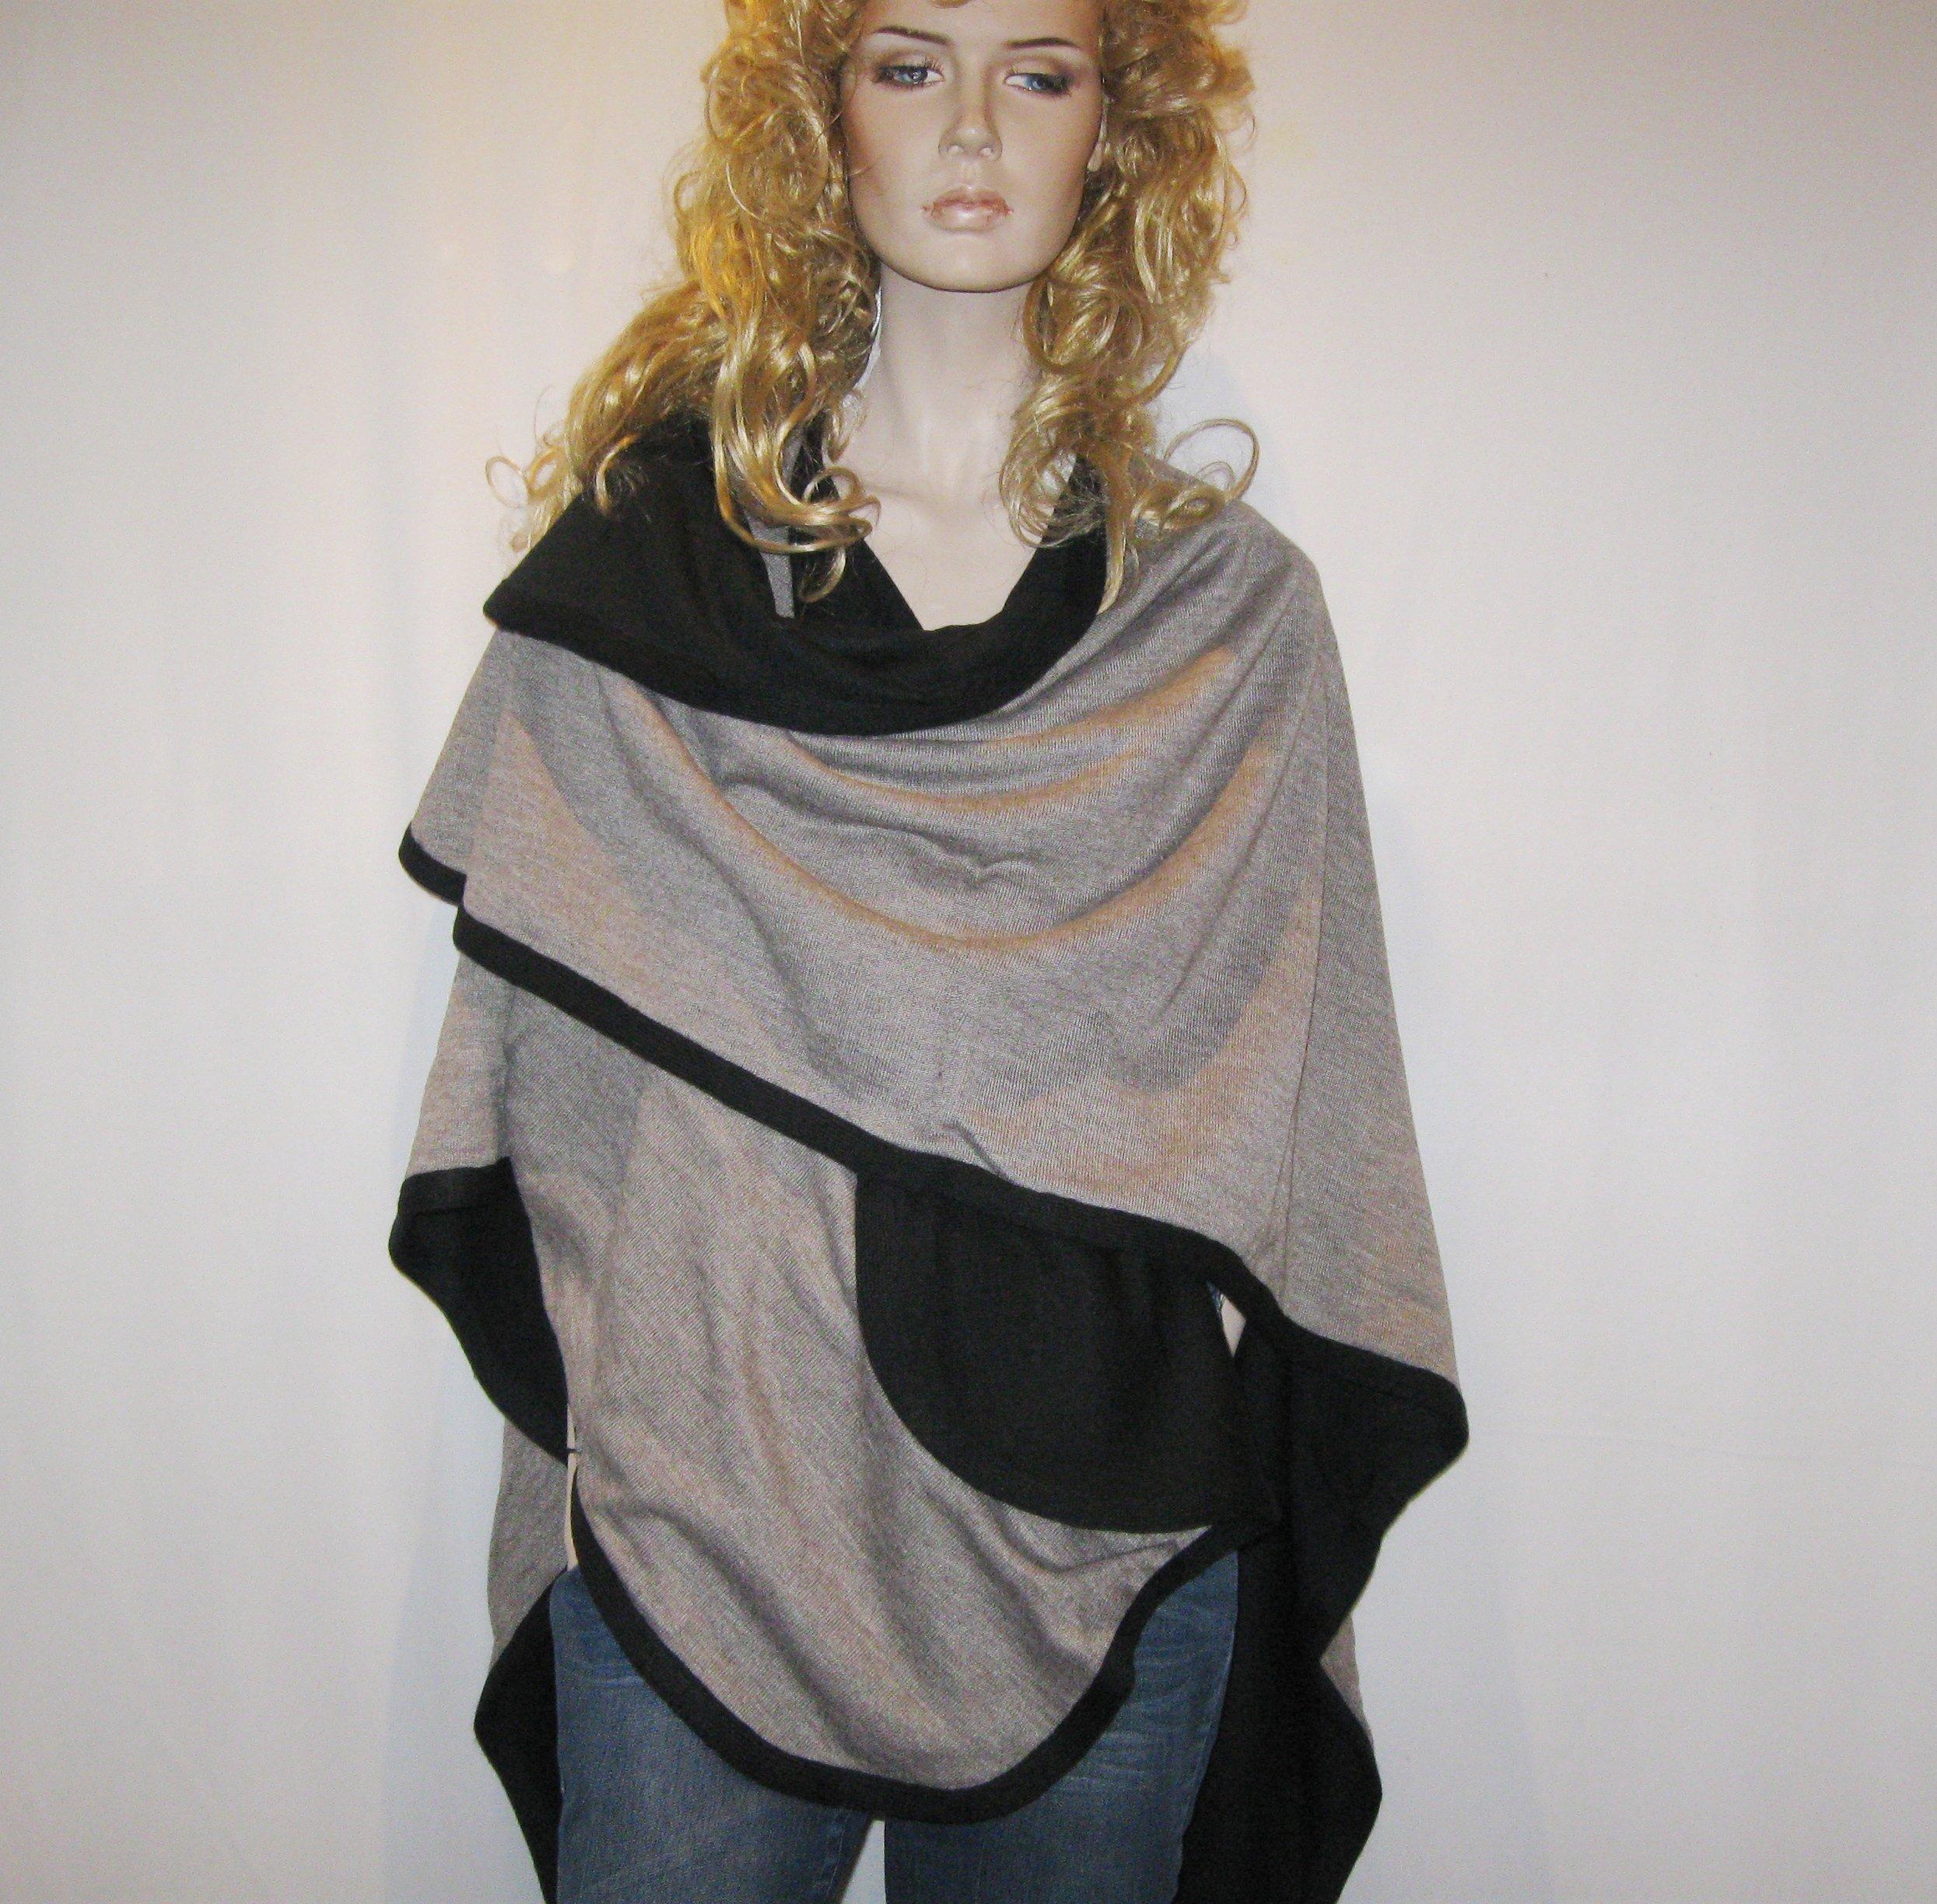 Cashmere Pashmina Group- Cape Woolen Reversible Ruana Knitted Poncho Shawl Cardigans Sweater Coat (Black/ Stone) by Cashmere Pashmina Group (Image #3)